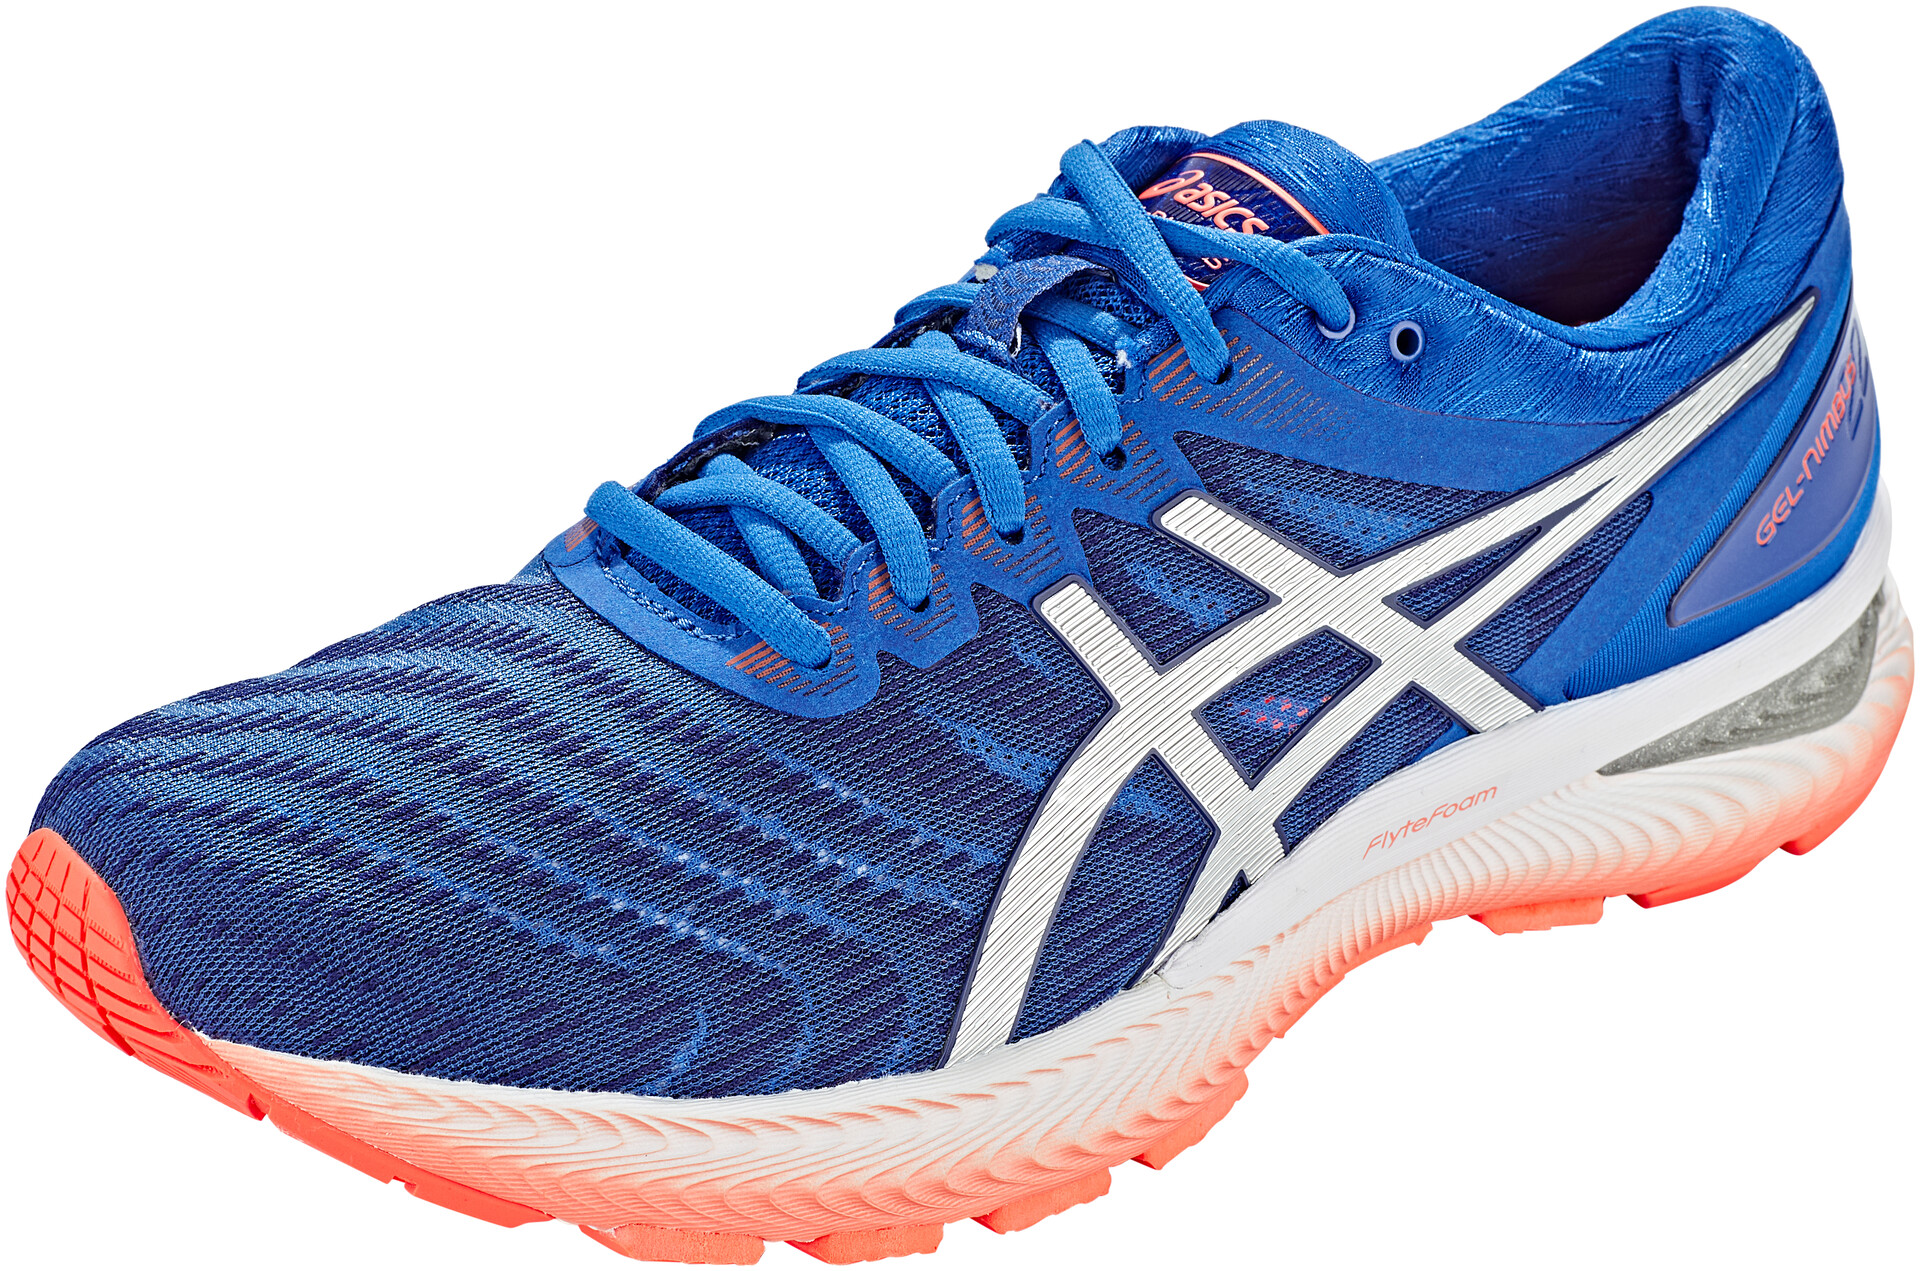 Asics Gel Nimbus 22 Mens Running Shoes Blue